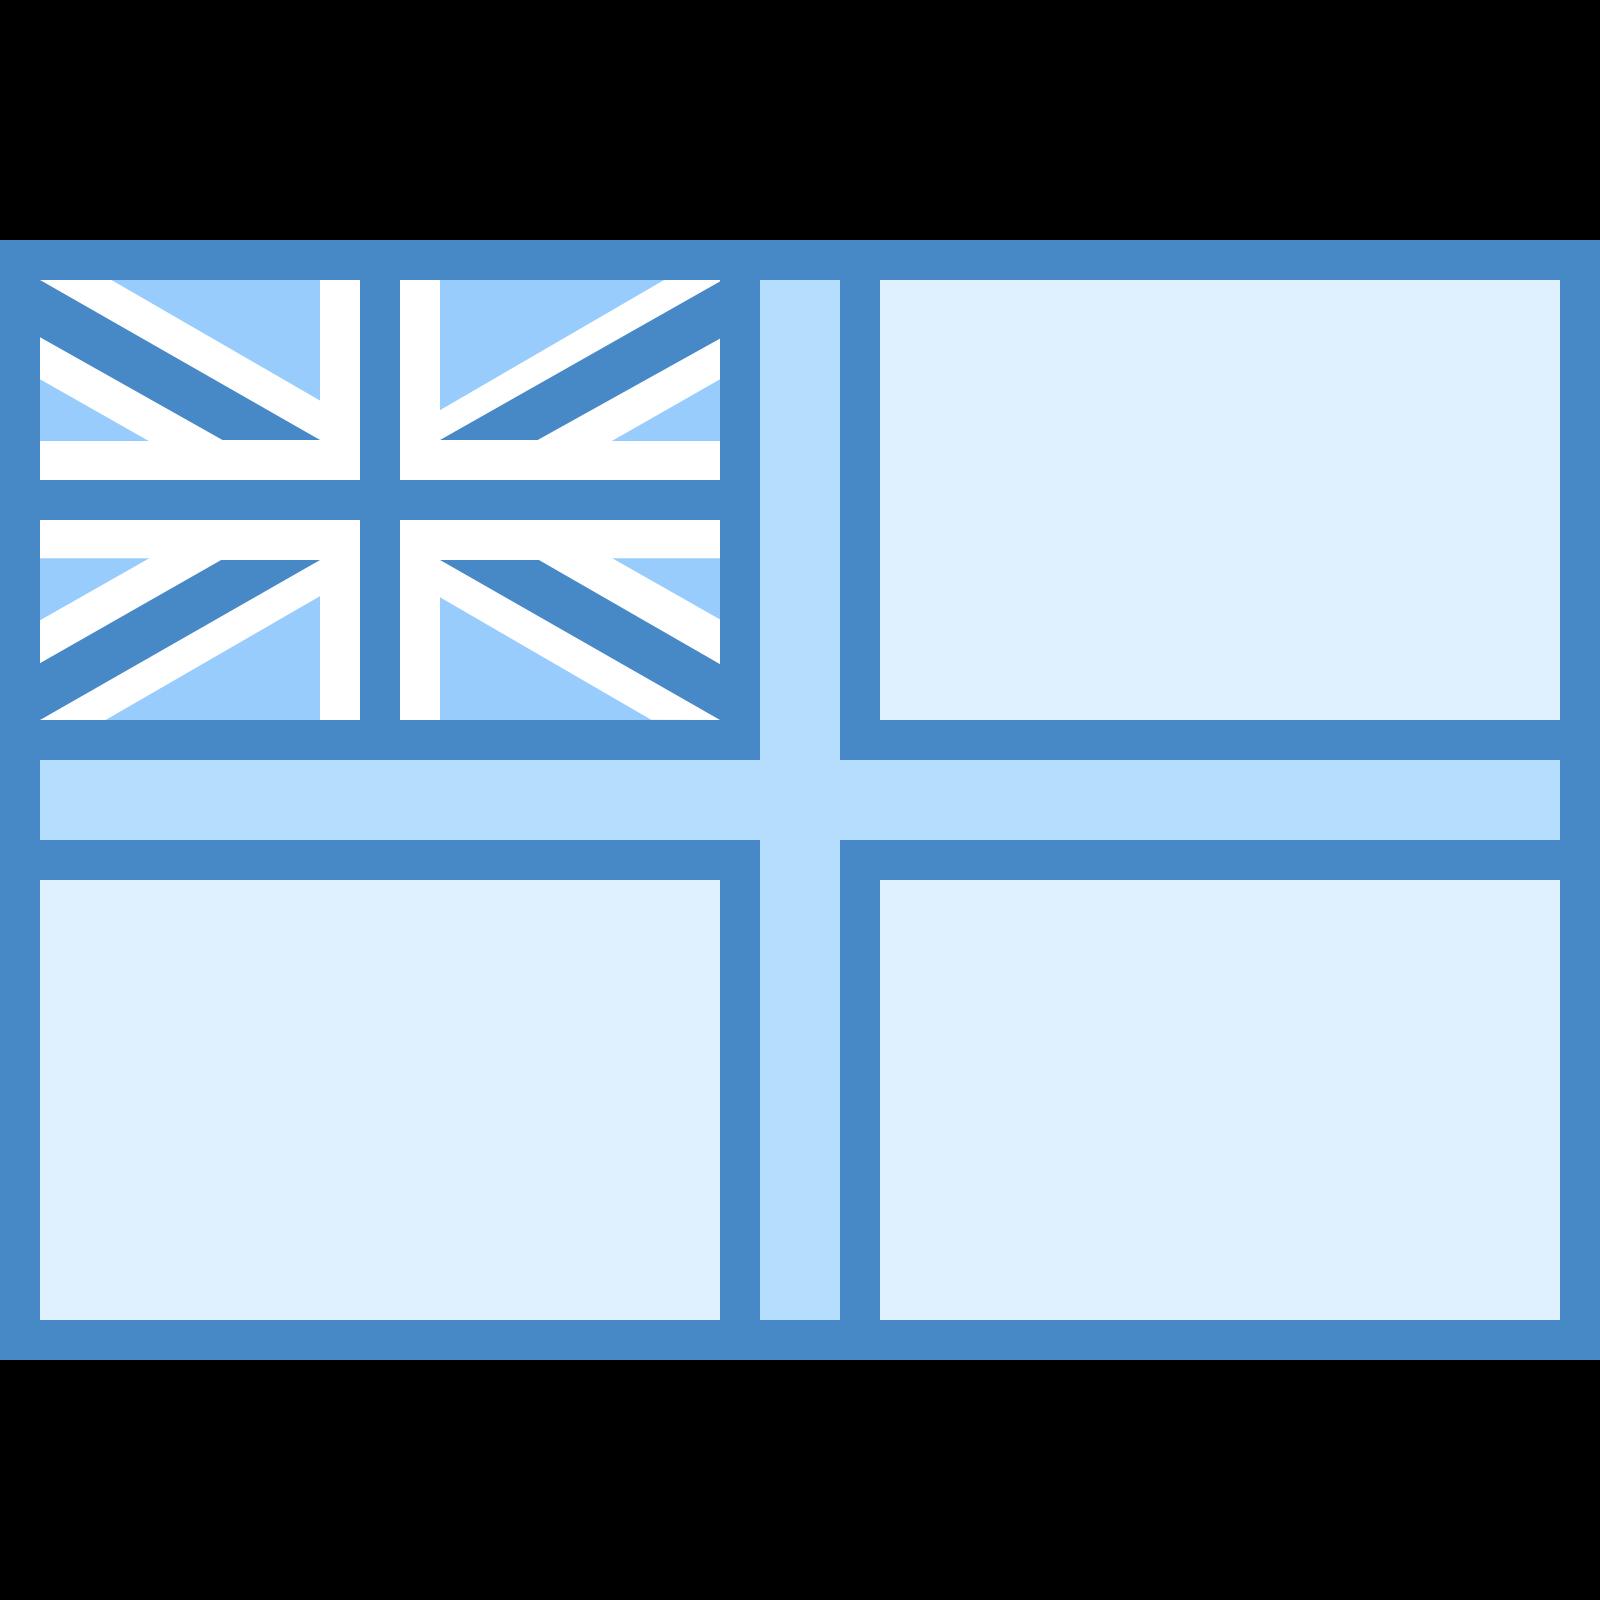 Royal Navy icon